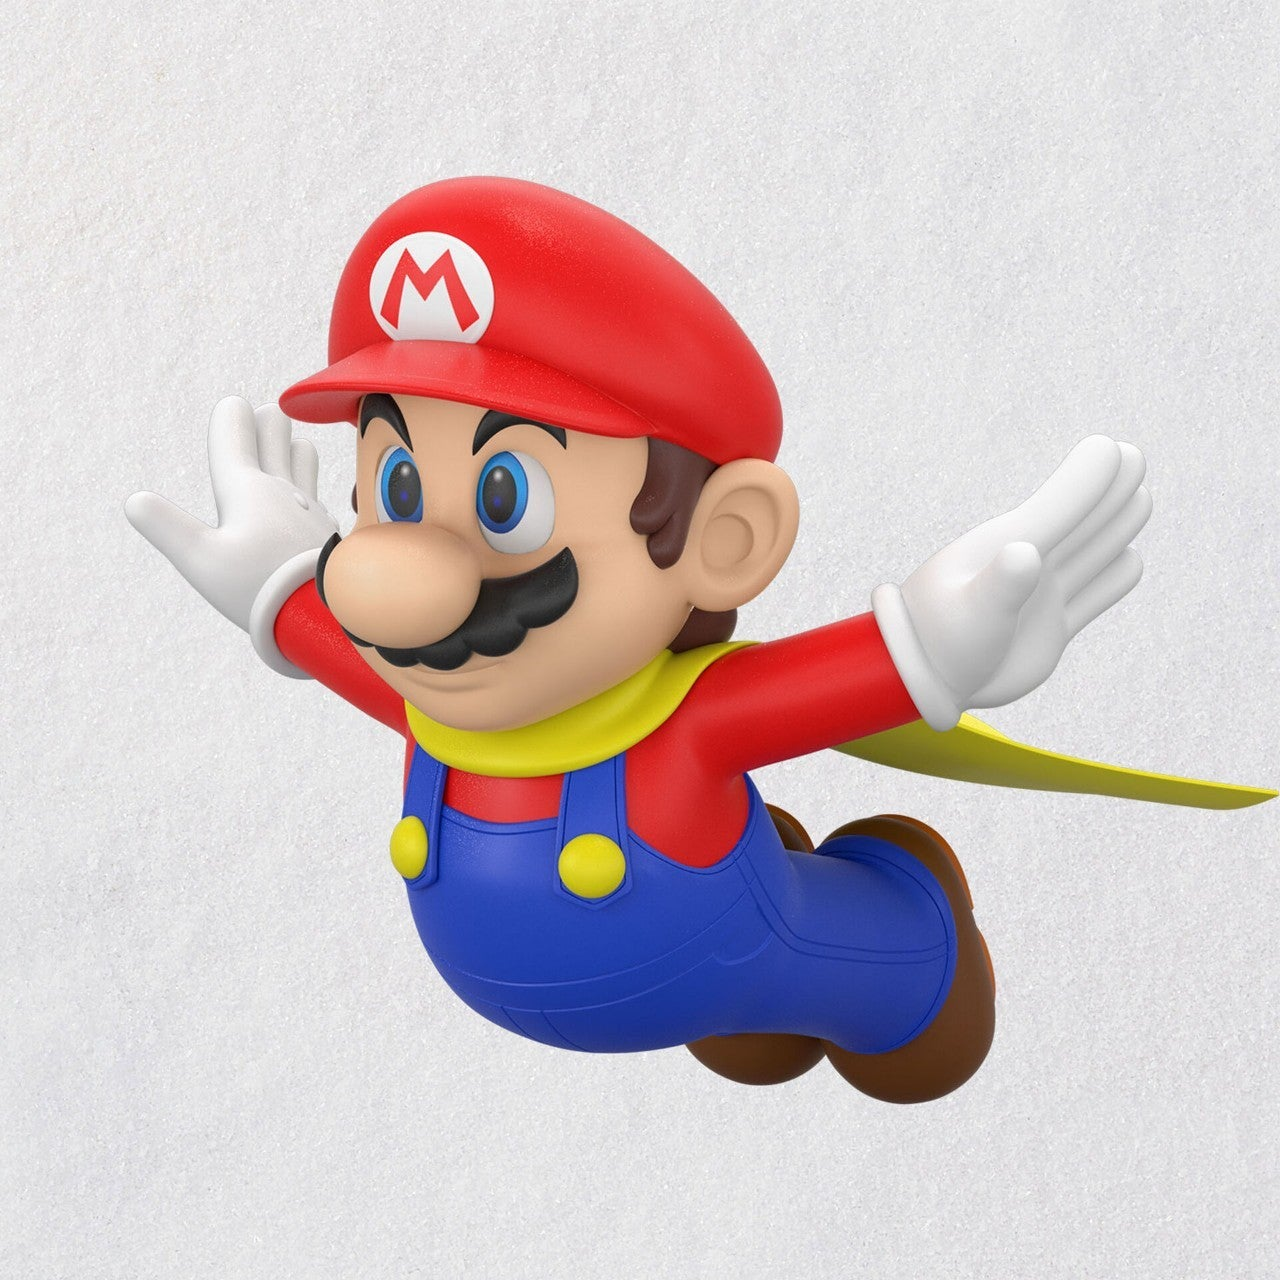 Nintendo-Caped-Mario-Andenken-Ornament_1799QXI7422_01